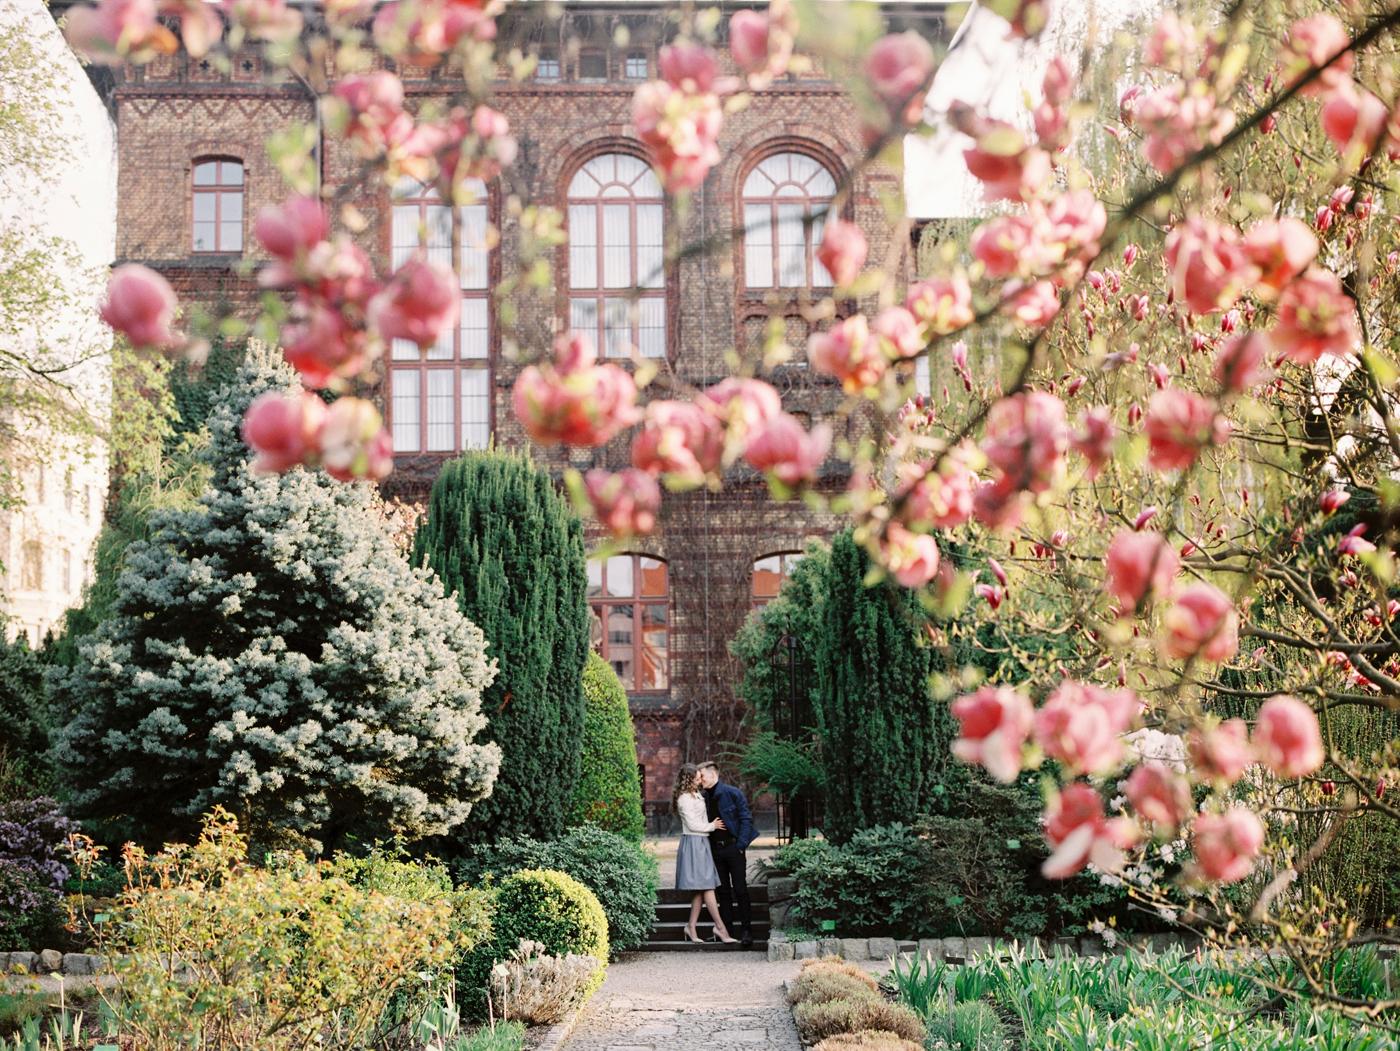 Engagement photosession on film. Wroclaw. Предсвадебная фотосессия на плёнку во Вроцлаве